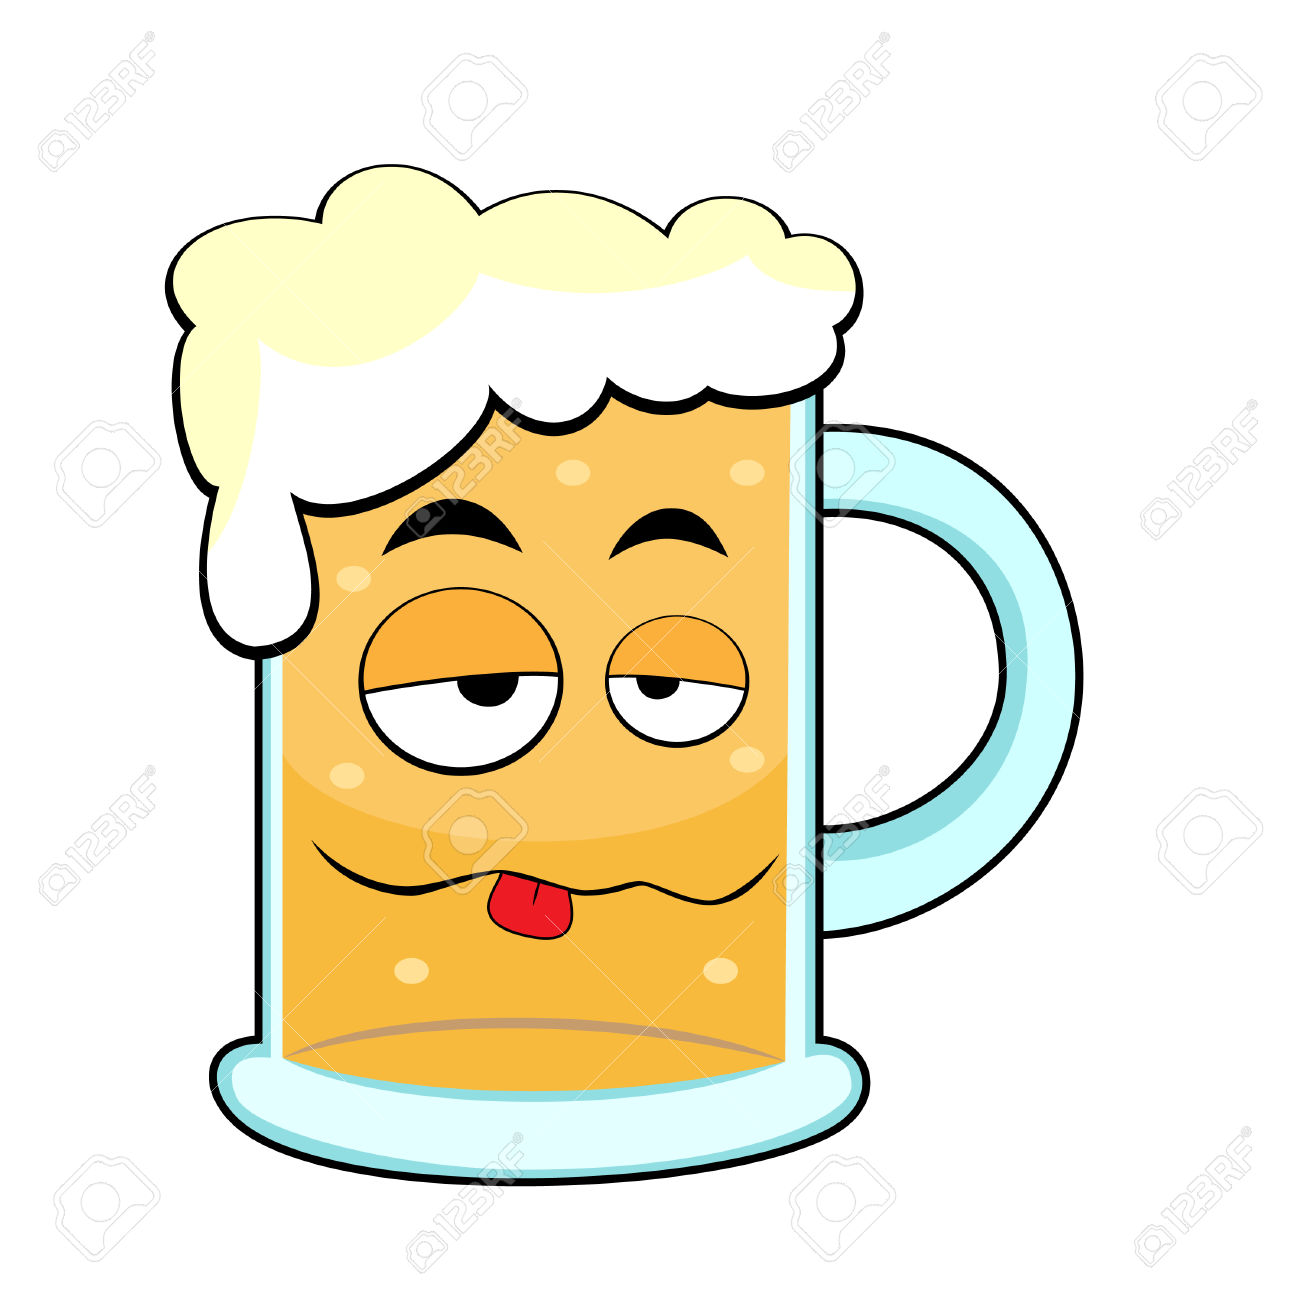 8285818-cute-drunk-beer-mug--Stock-Vector-cartoon